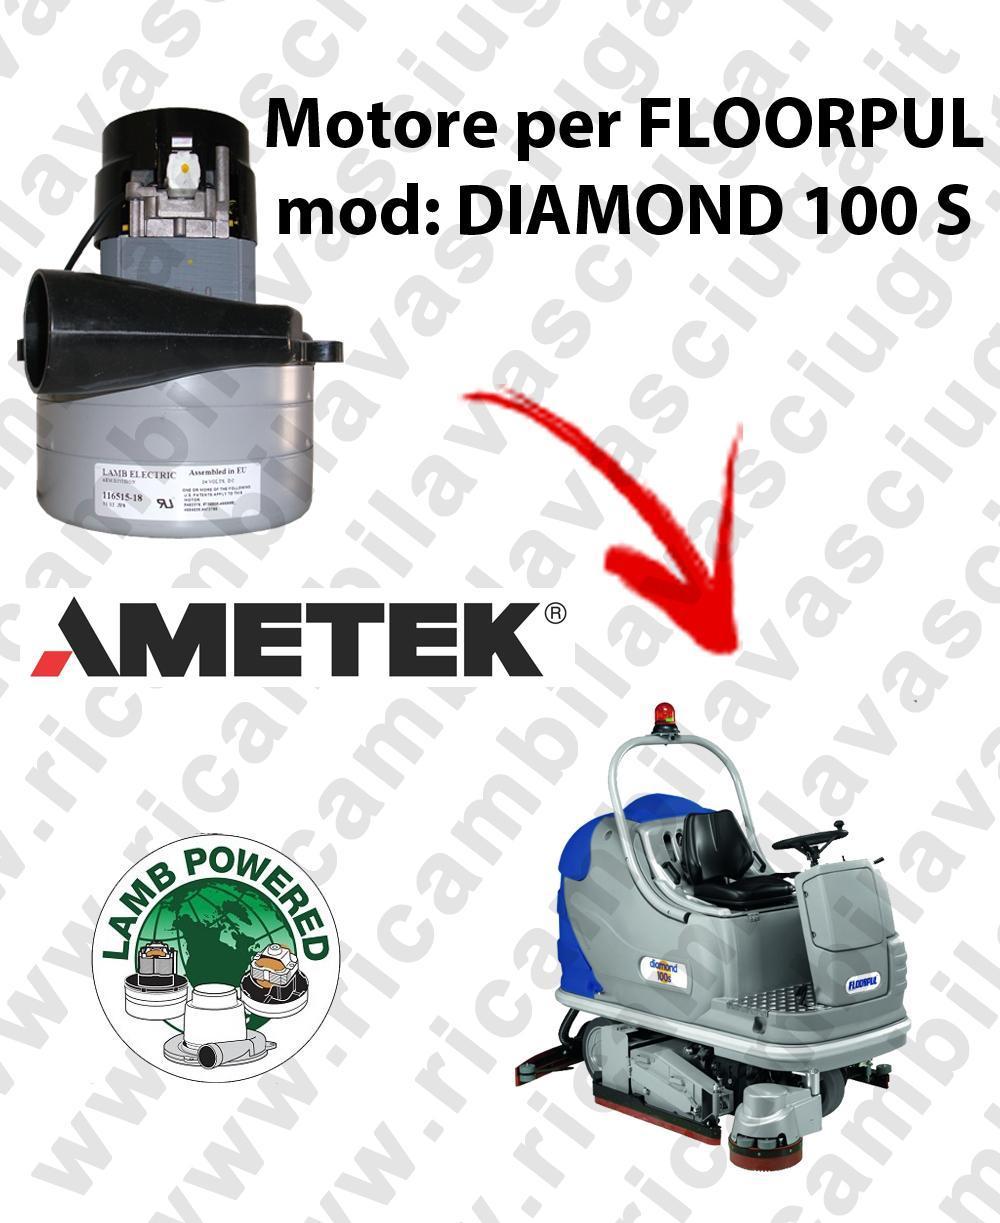 DIAMOND 100 S Saugmotor LAMB AMETEK für scheuersaugmaschinen FLOORPUL